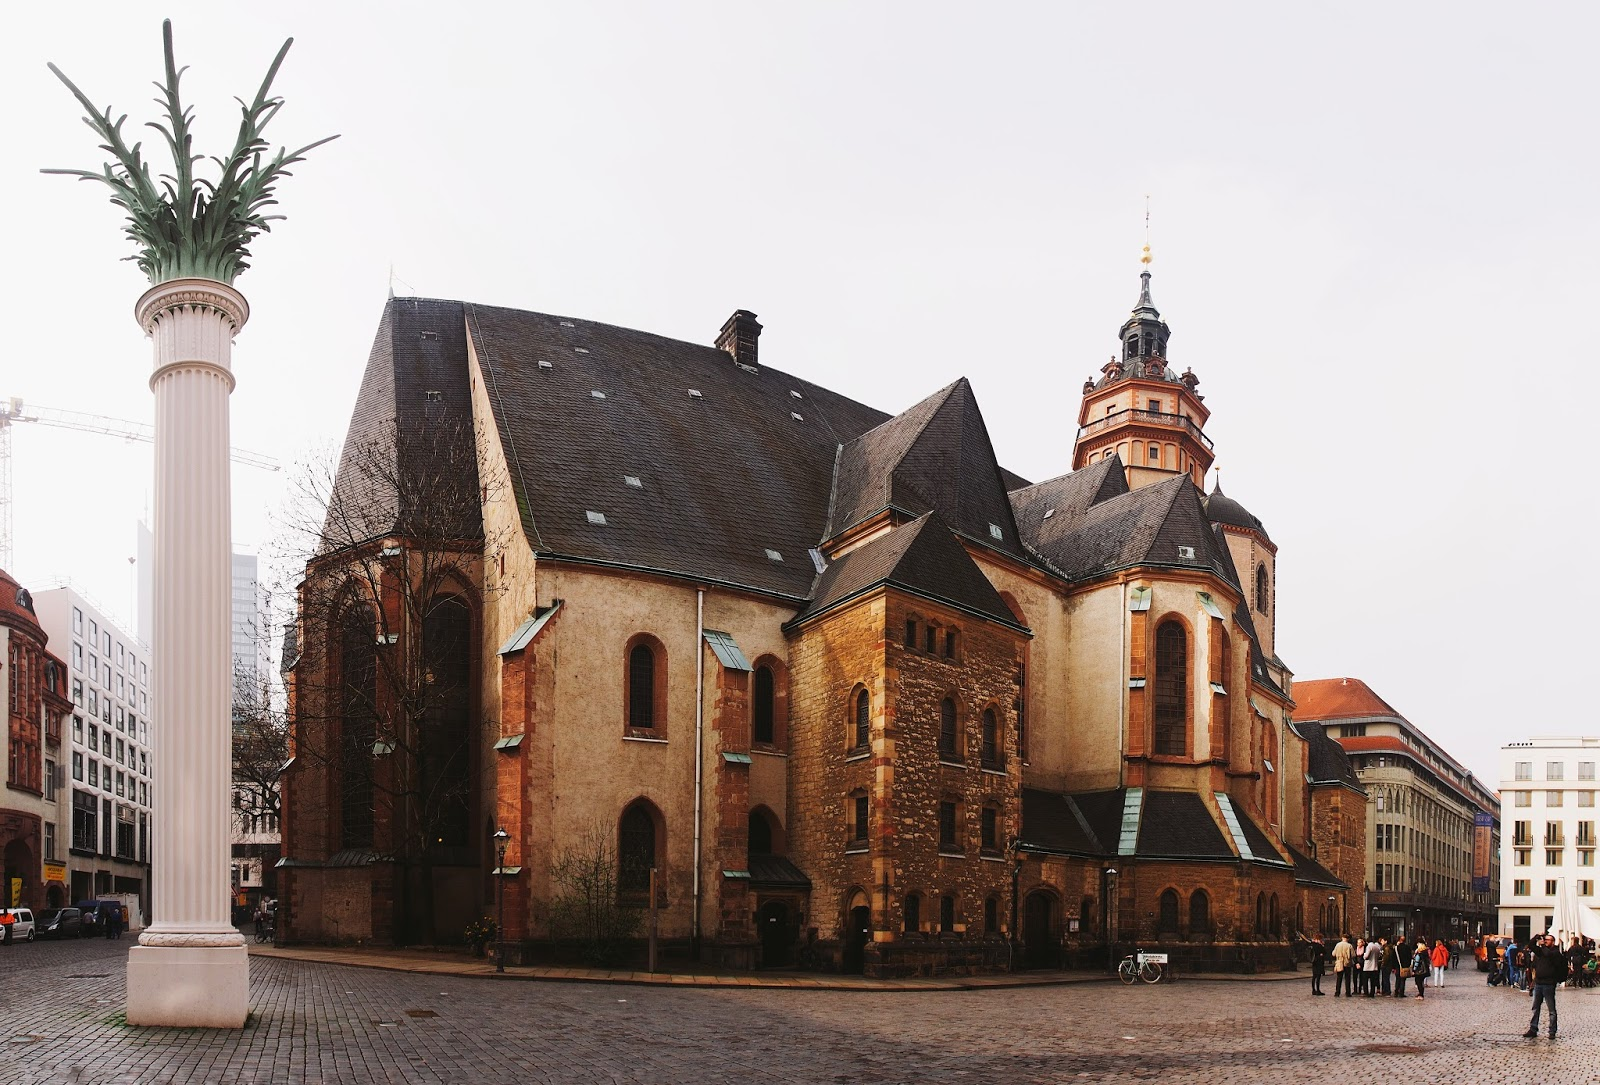 LGM2014 Leipzig Germany photowalk Nikolaikirche GIMP